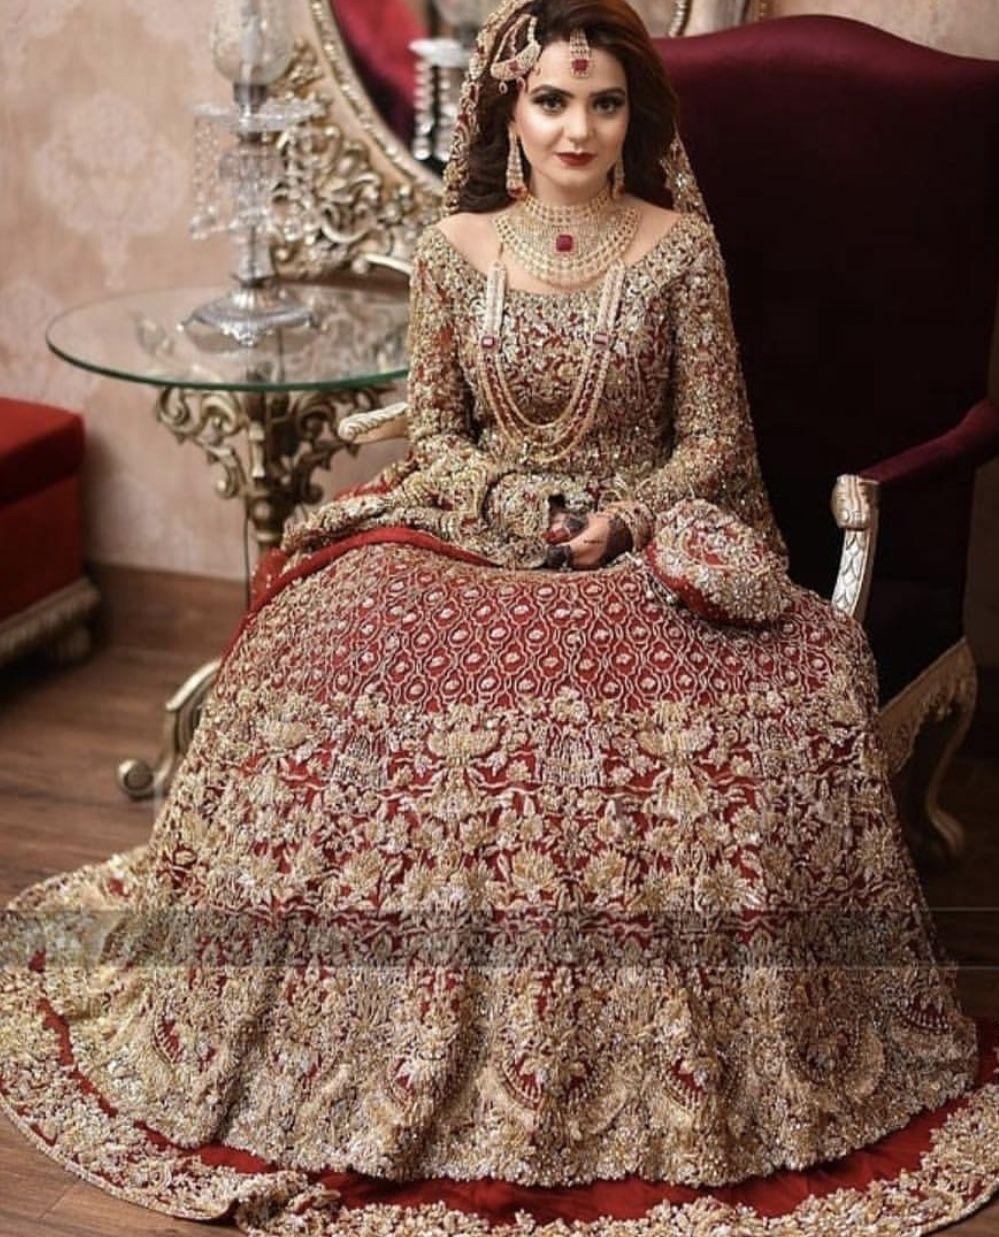 Afshi Majid Dresses In 2019 Pakistani Bridal Dresses Mehndi